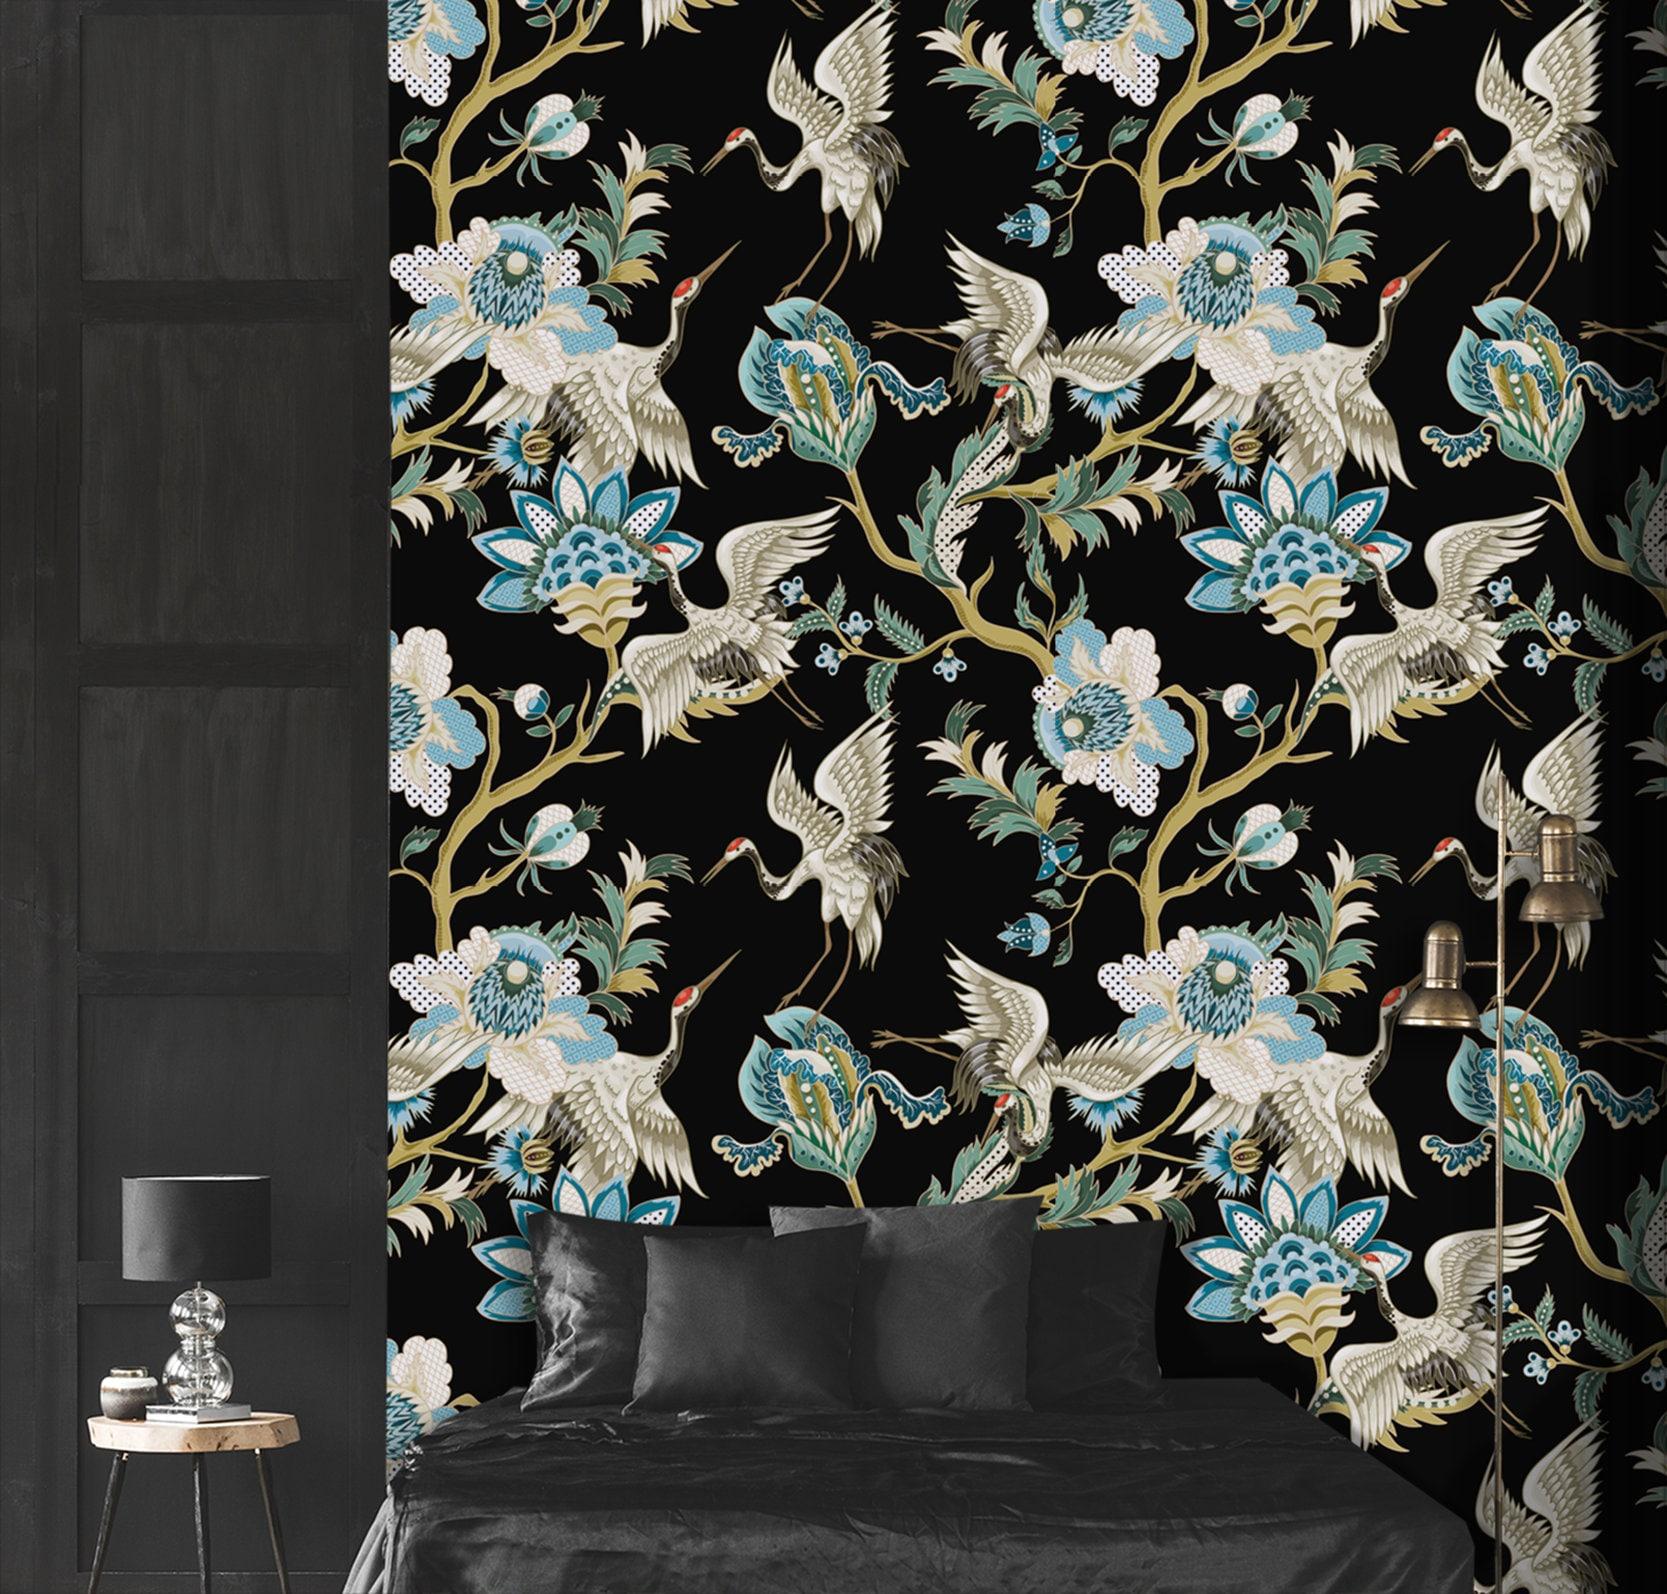 Japanese Art Wallpaper Removable Wallpaper Dark Floral Etsy